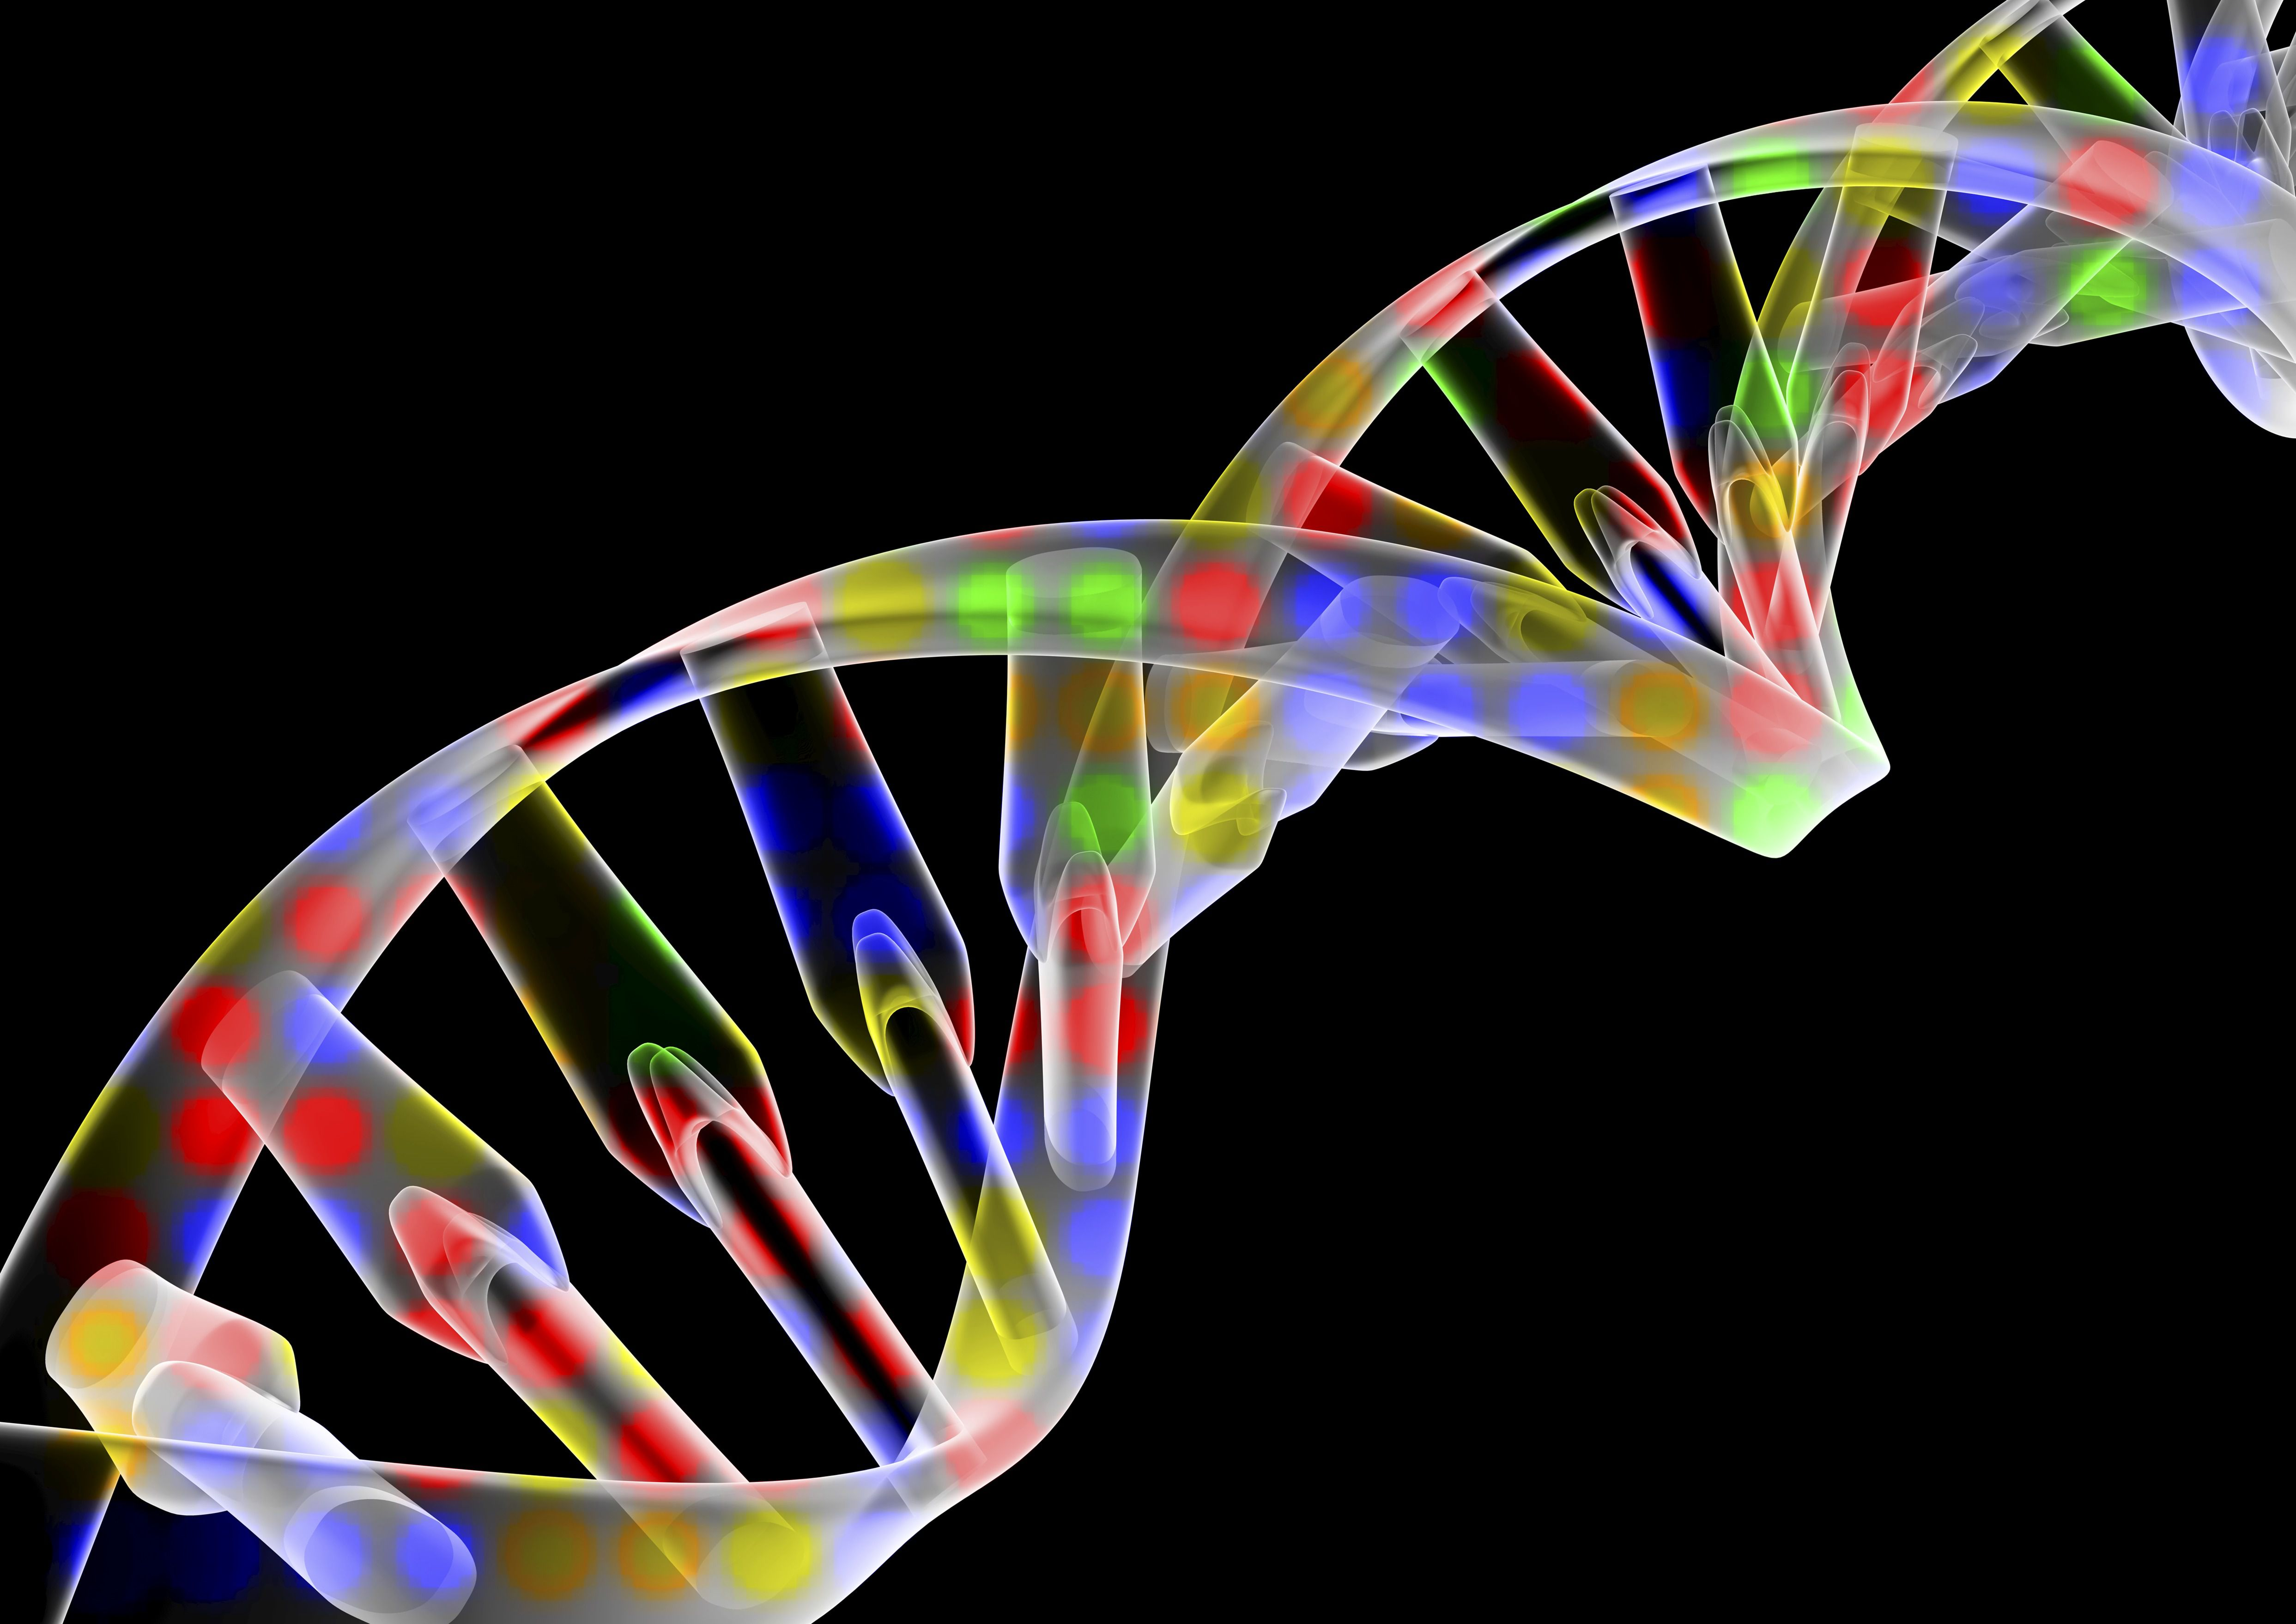 Introduction to CRISPR Genome Editing